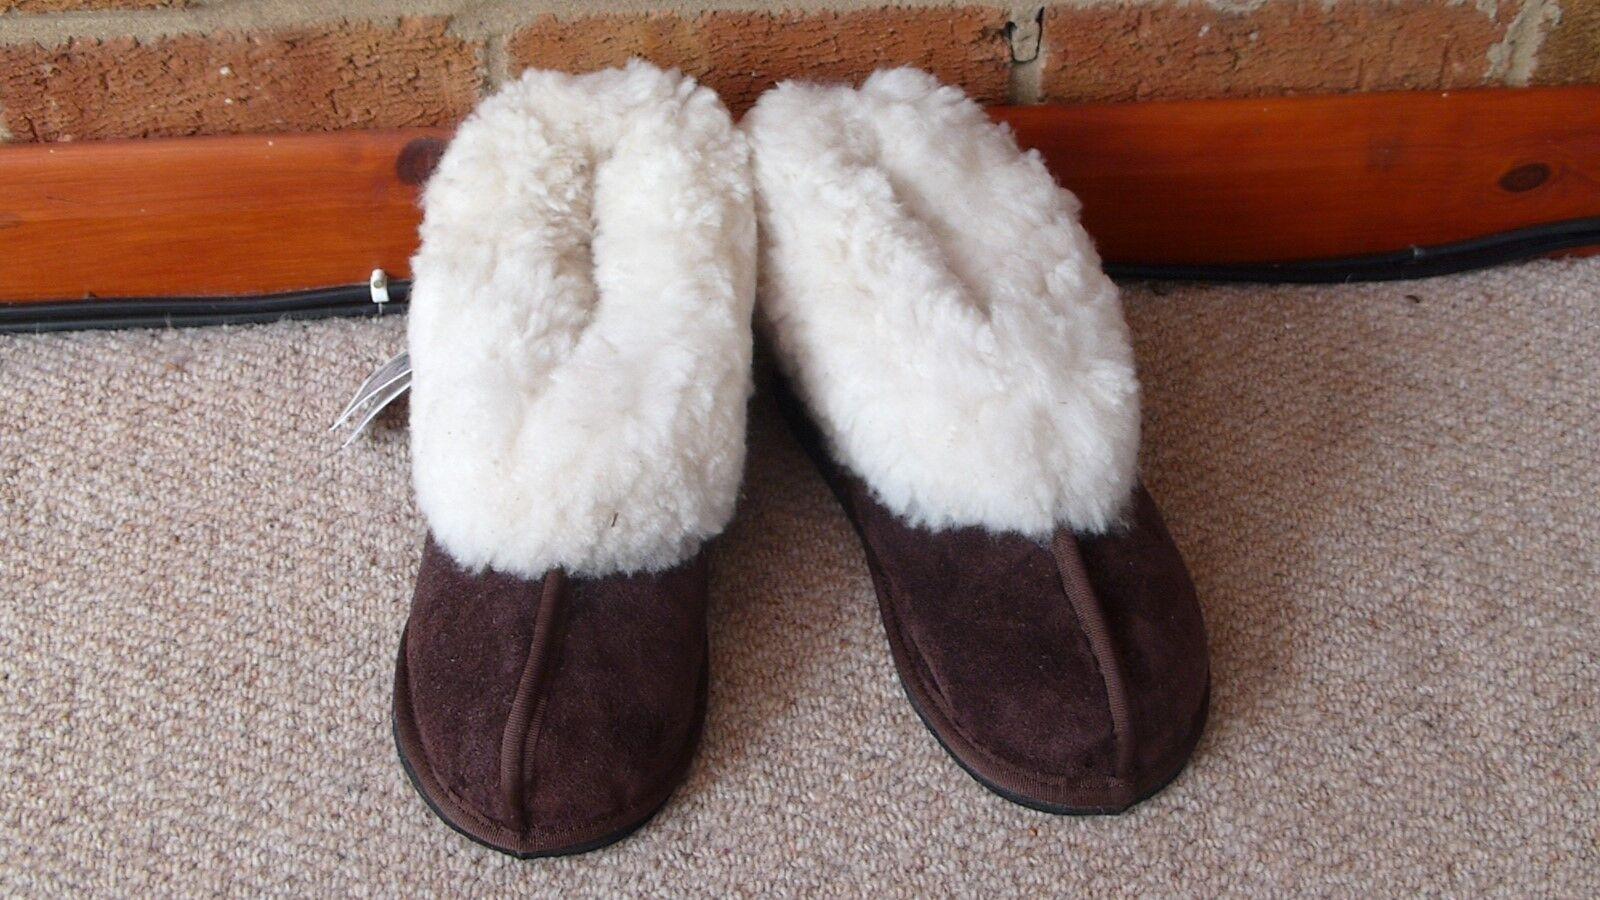 KARU Genuine Sheepskin Slippers (Cuff) Unisex UK Adult Gre 1 to  Adult Gre 14